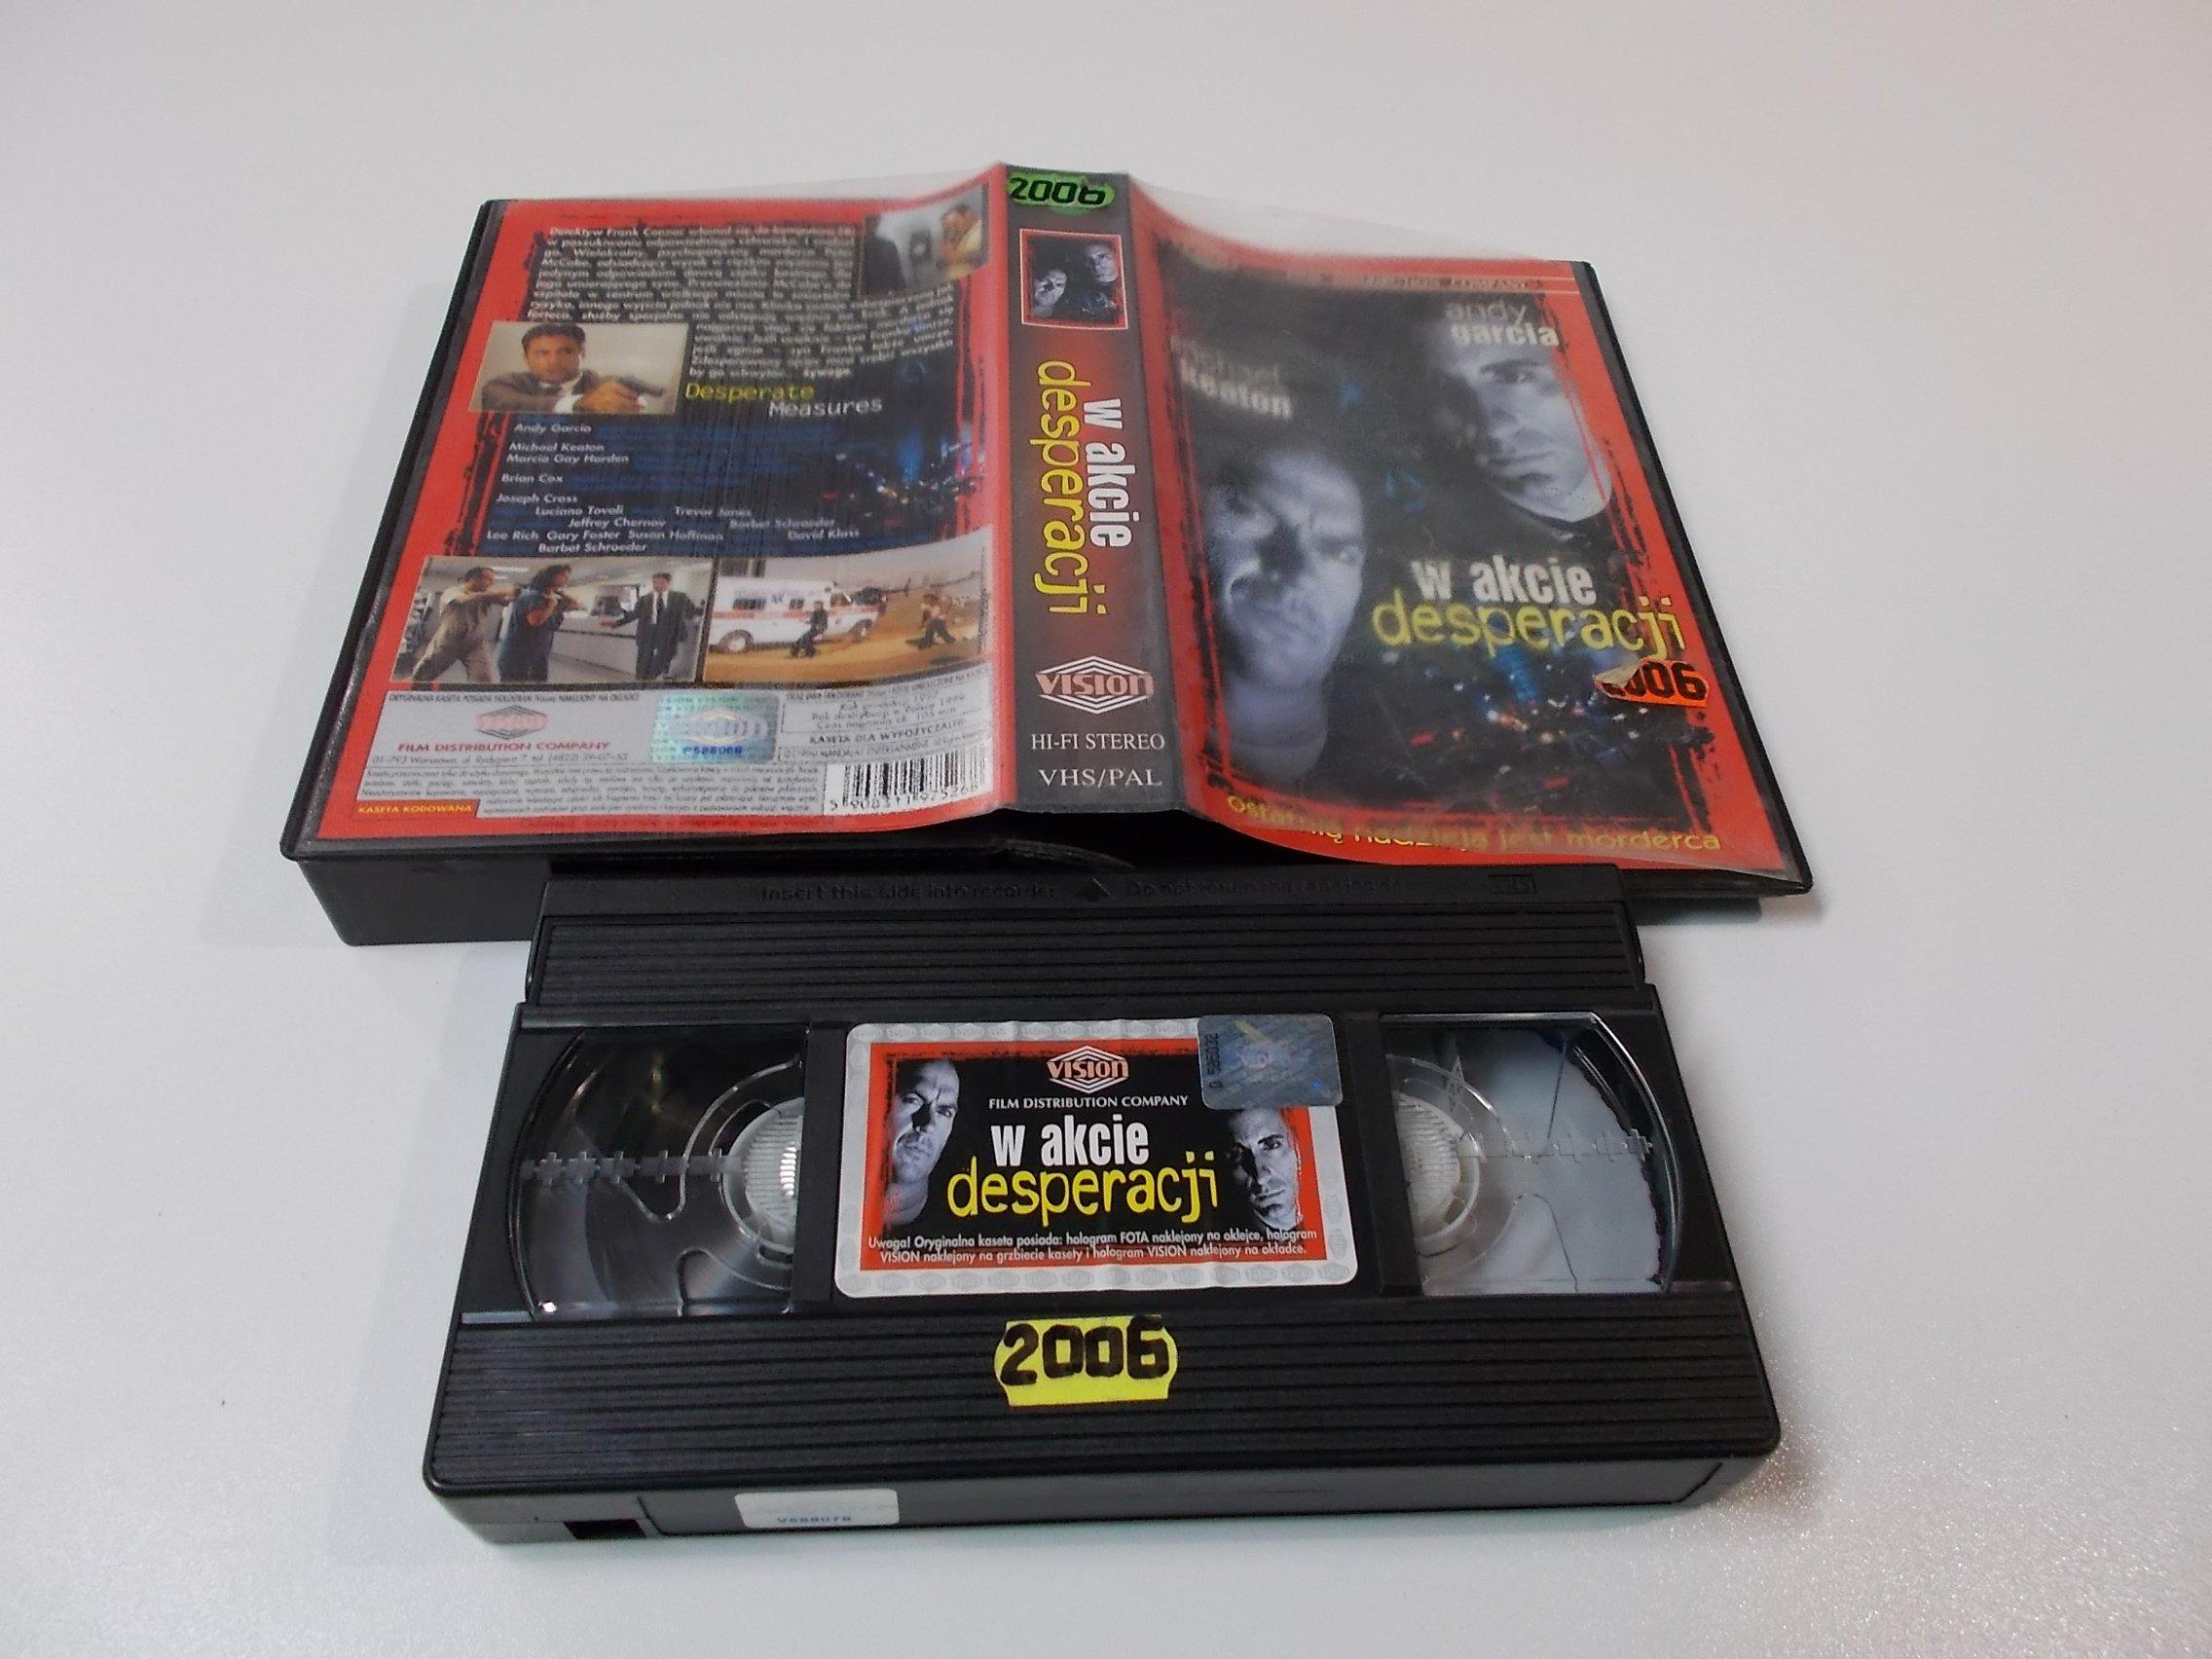 W AKCIE DESPERACJI - VHS Kaseta Video - Opole 1607